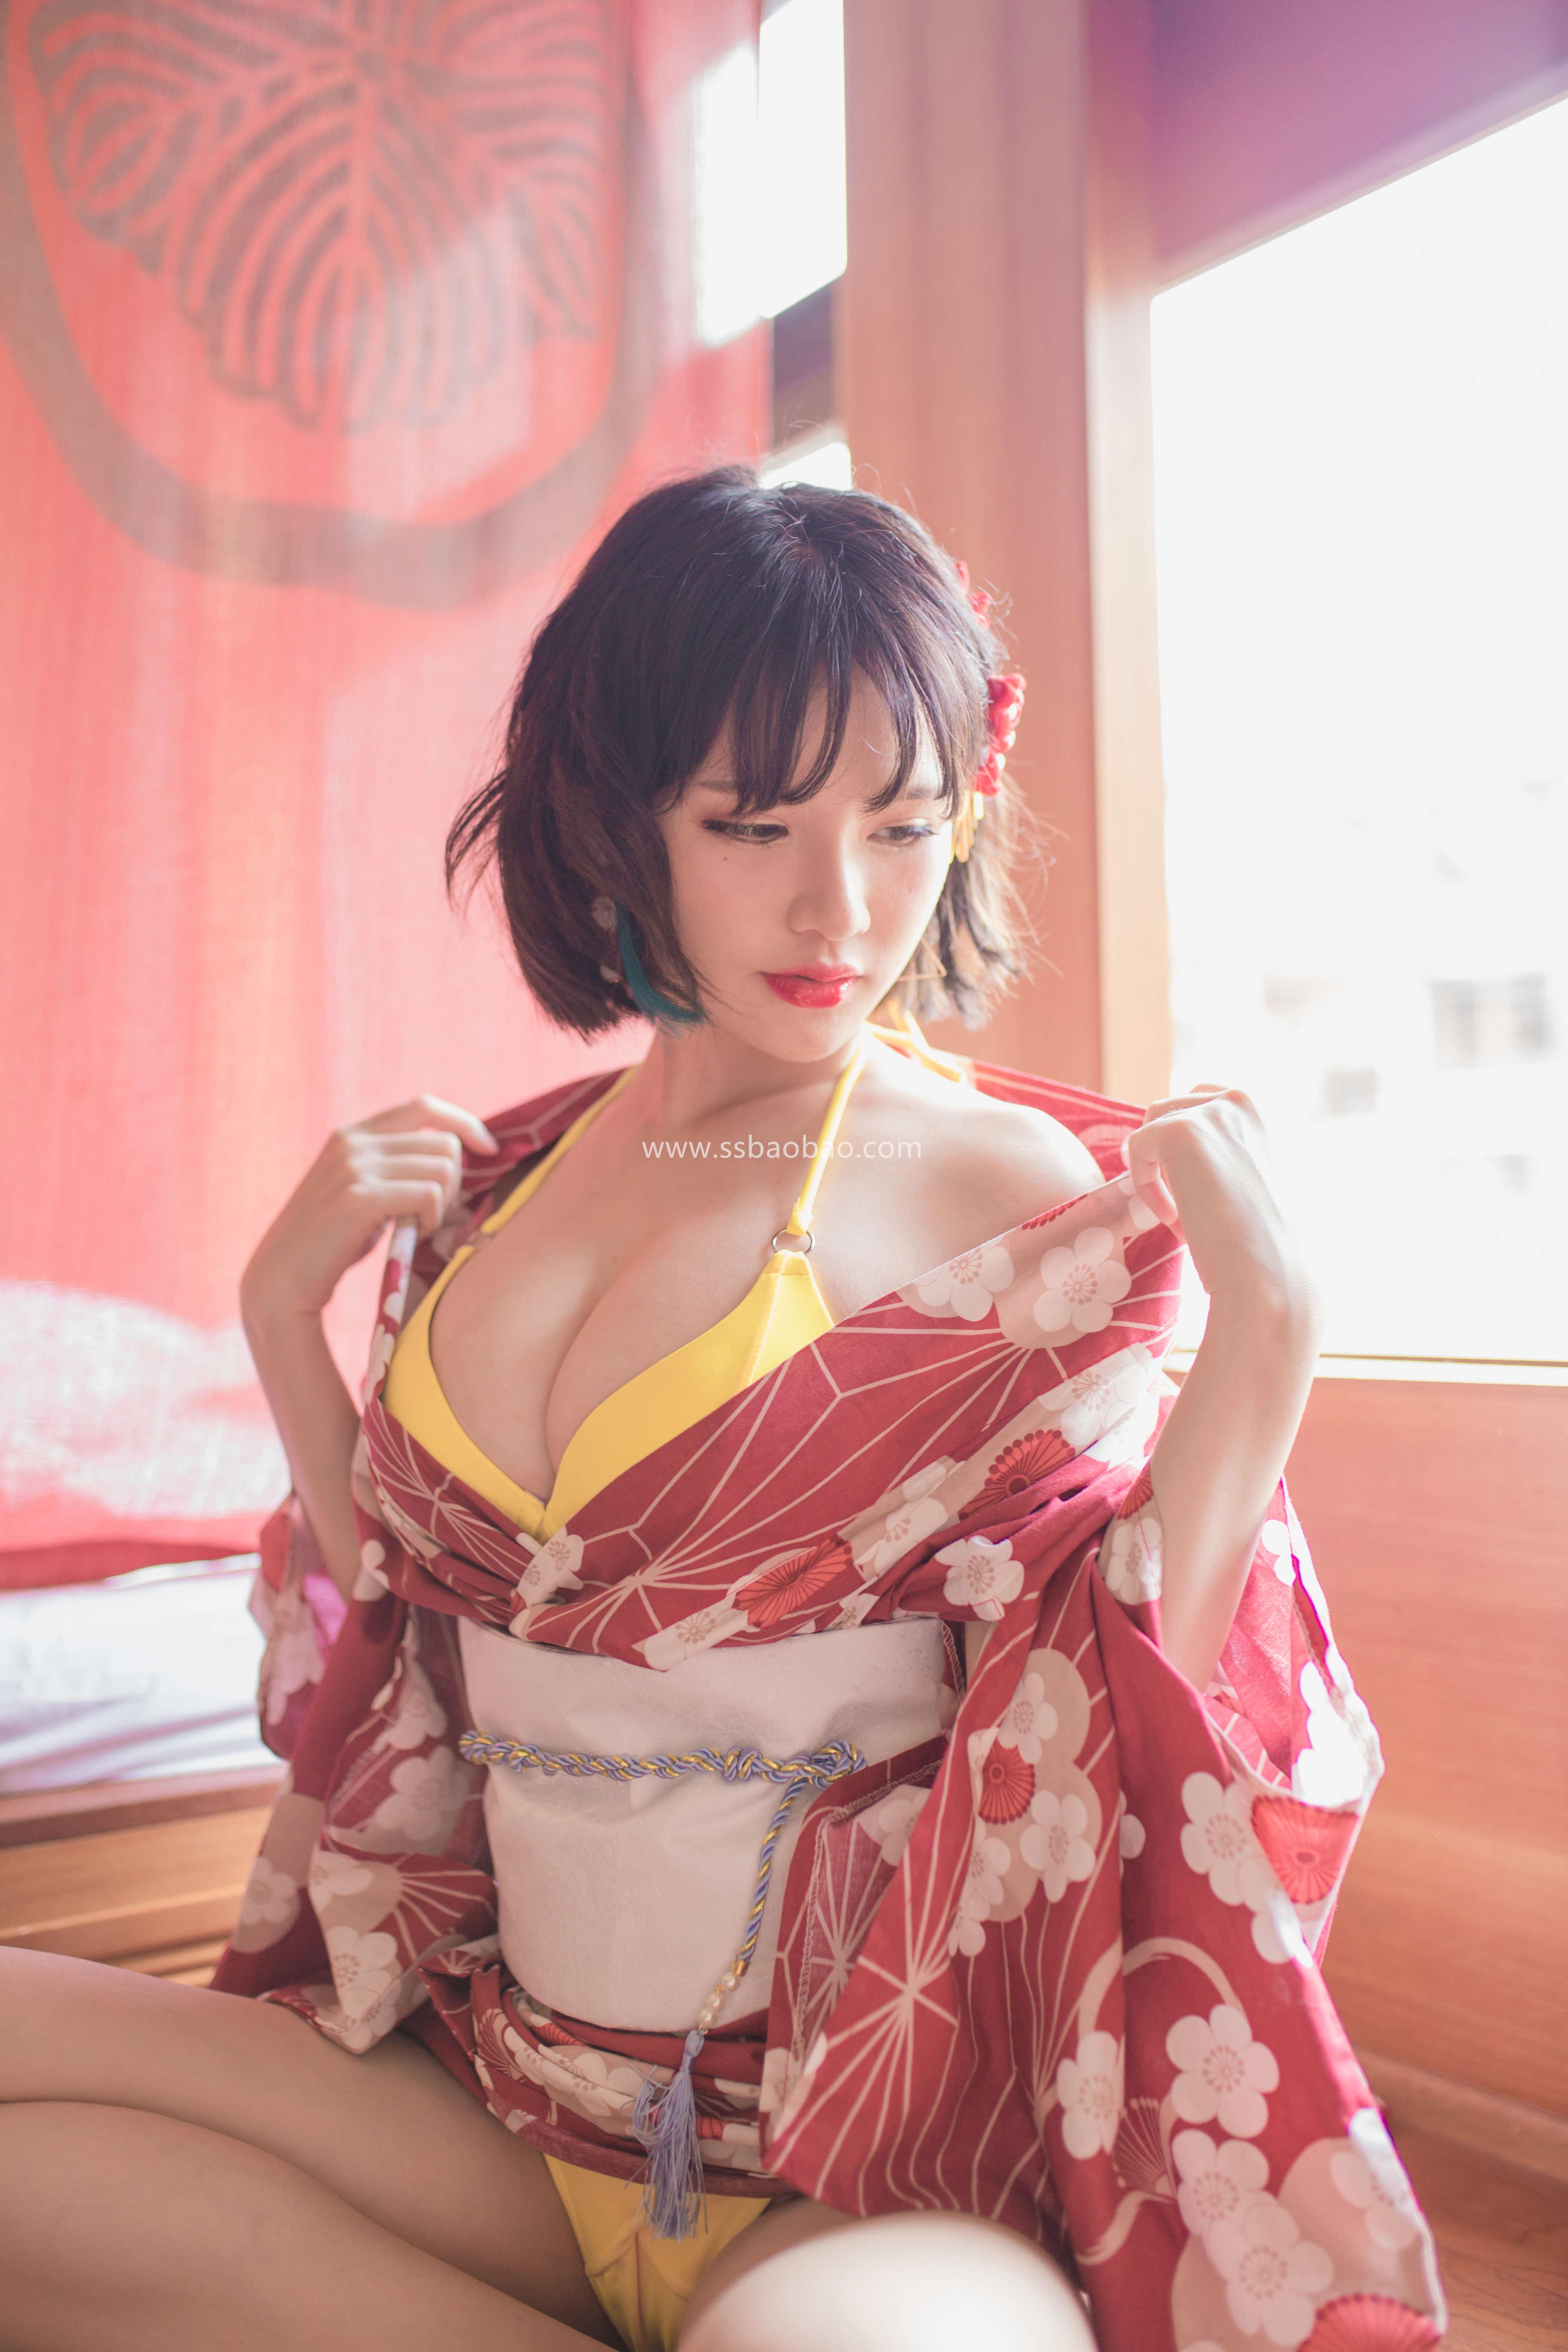 Yoko宅夏 - 妹汤物语(和服)[53P-313MB]03